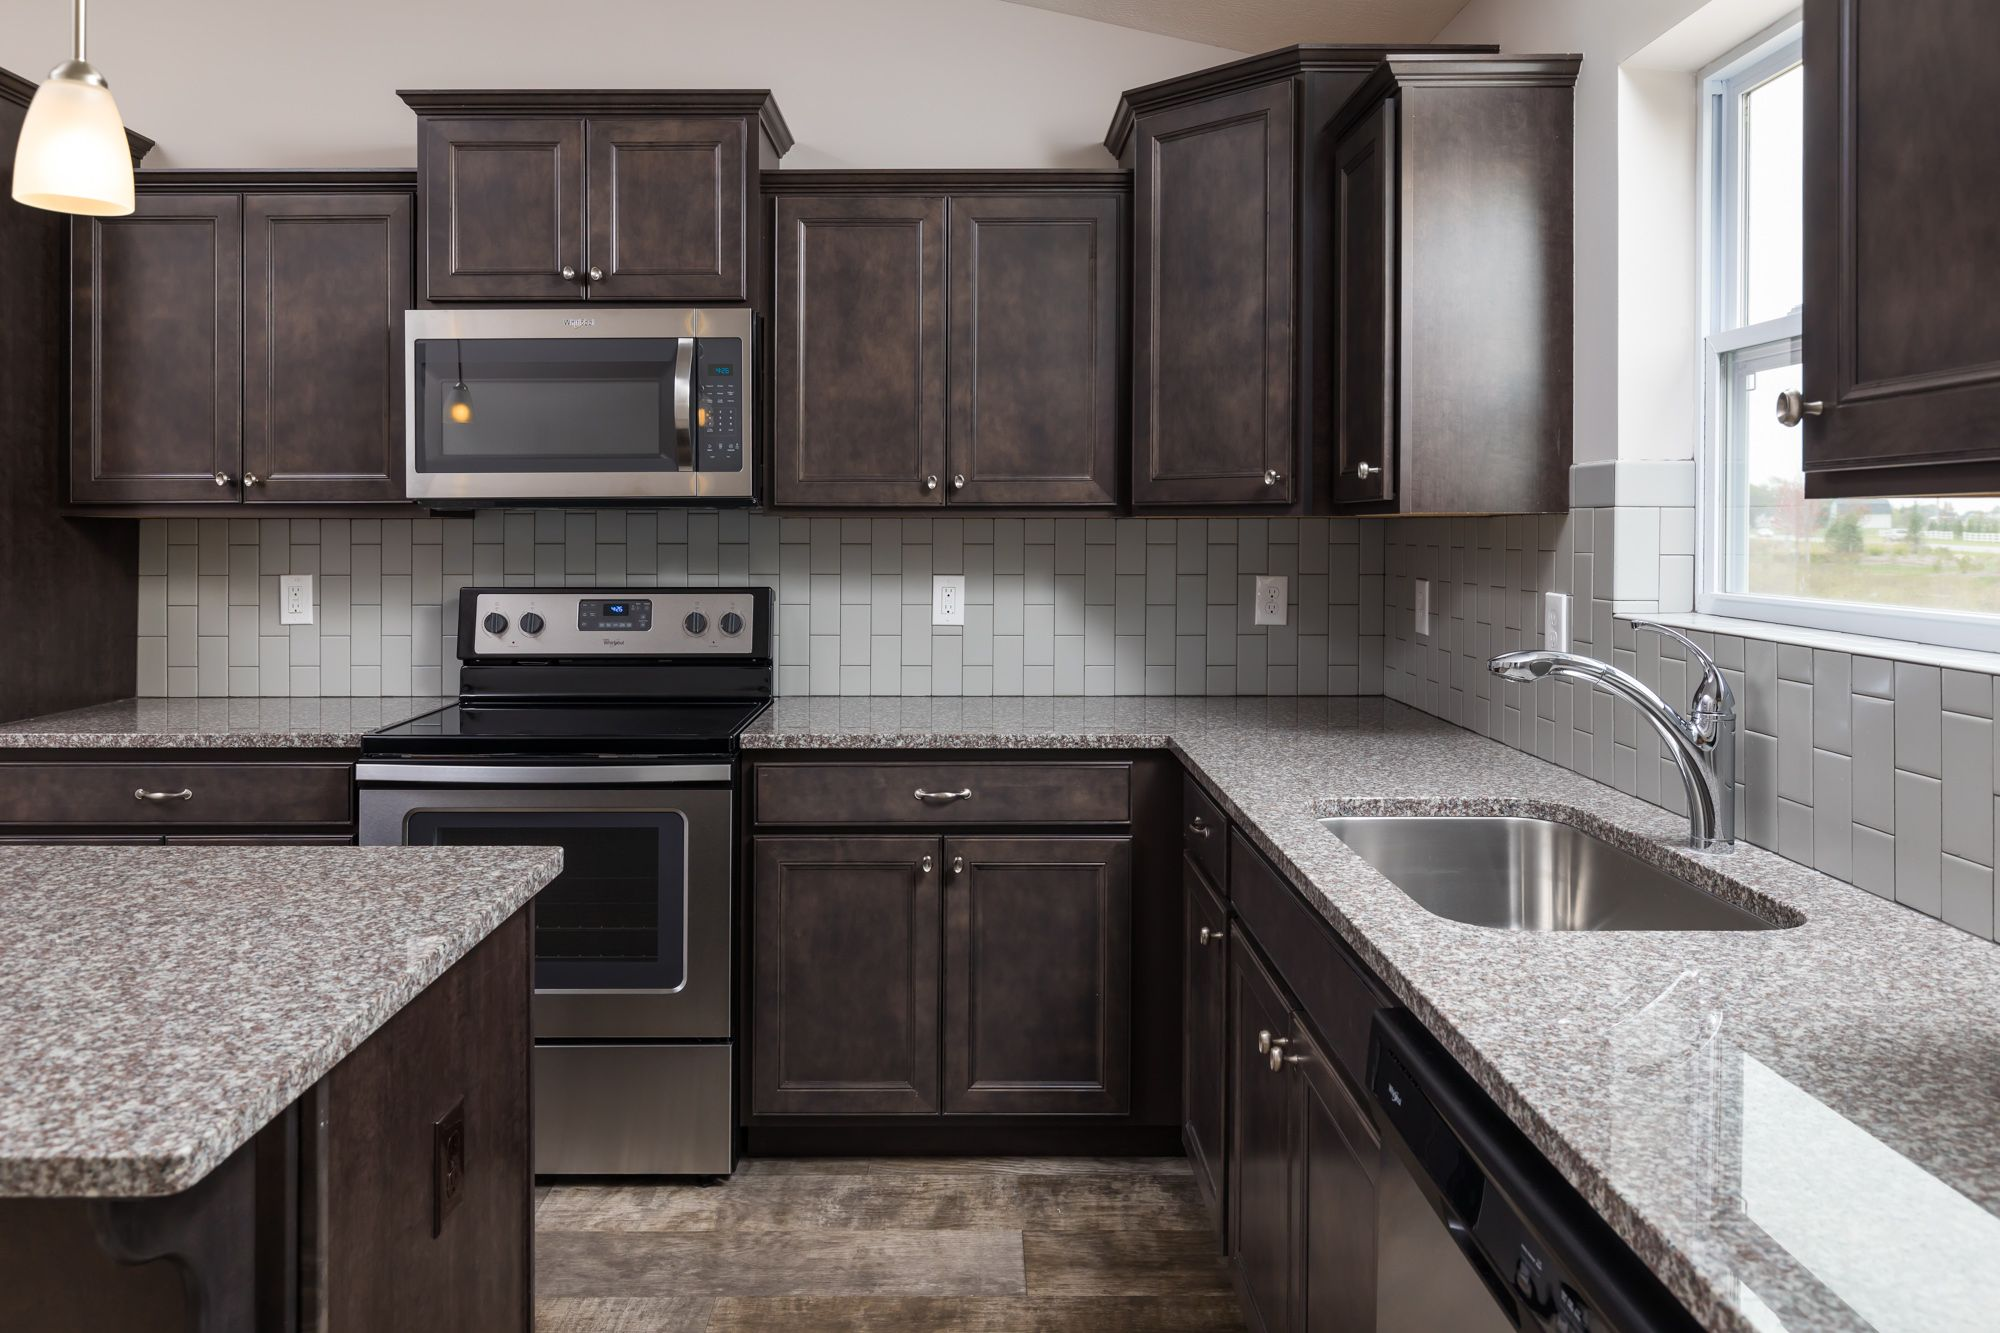 Kitchen featured in the Elements 1600 By Allen Edwin Homes in Detroit, MI